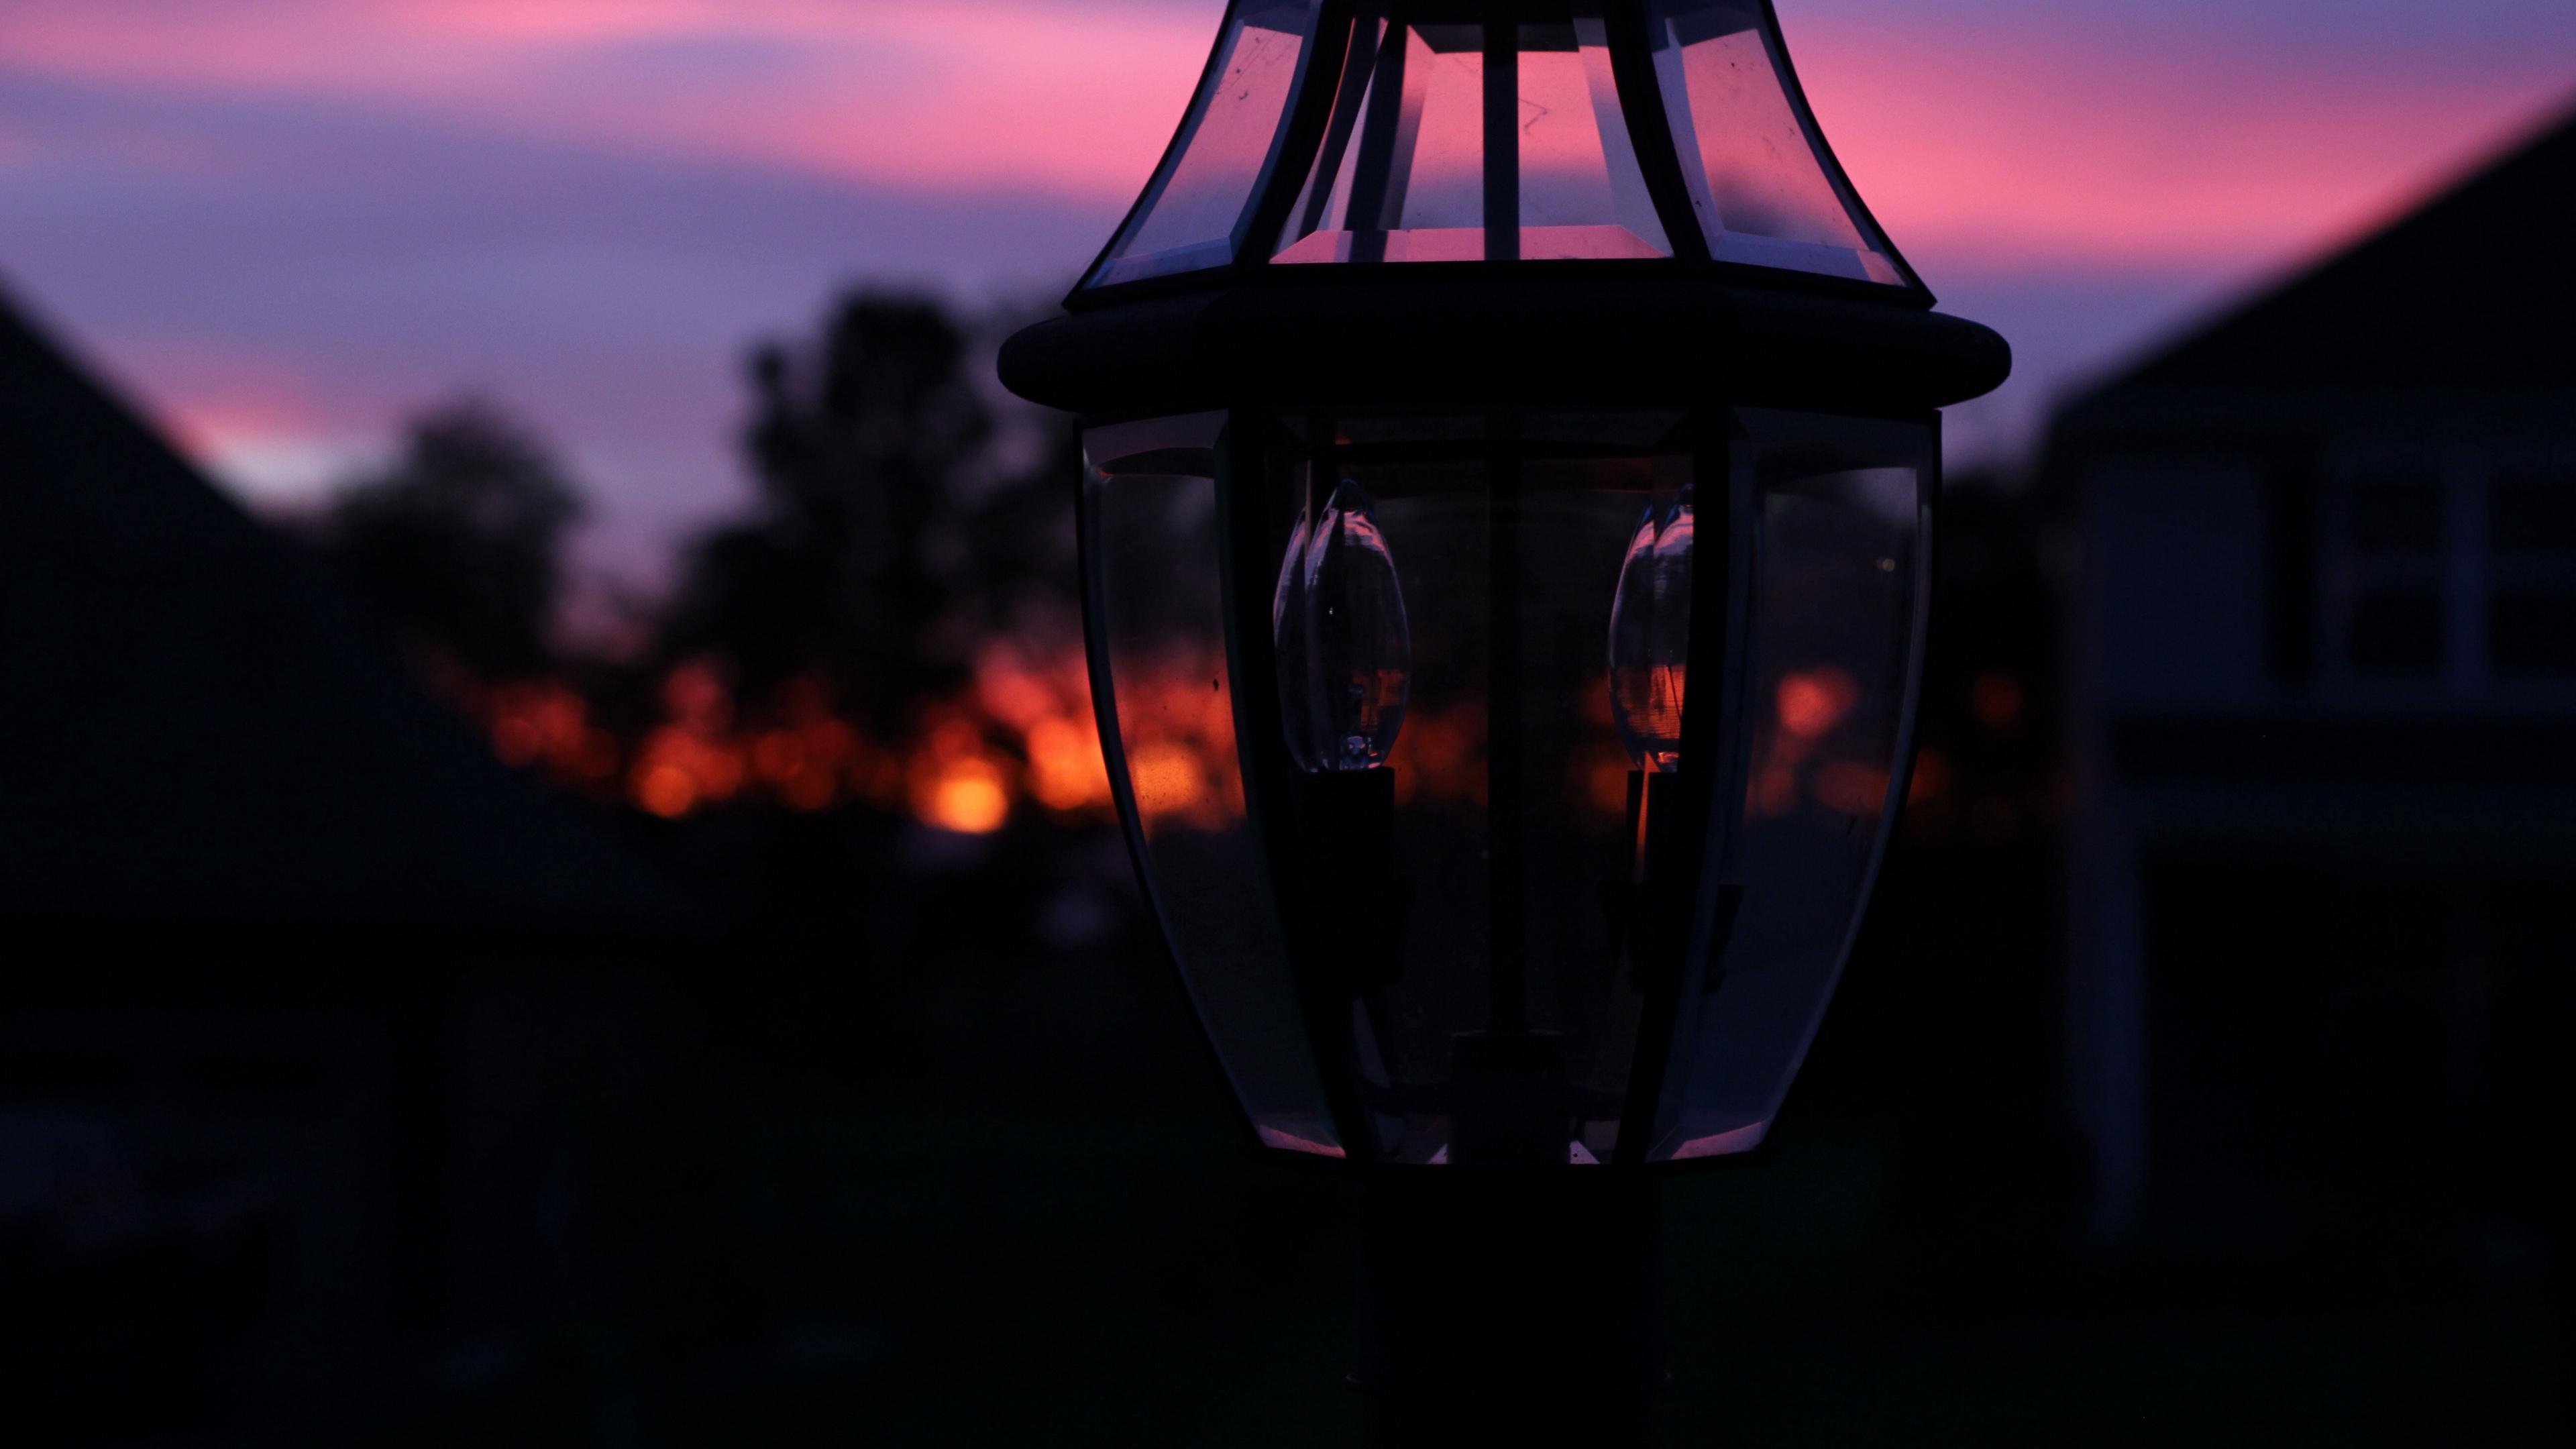 lamp night light lighting 4k 1540575049 - lamp, night, light, lighting 4k - Night, Light, lamp